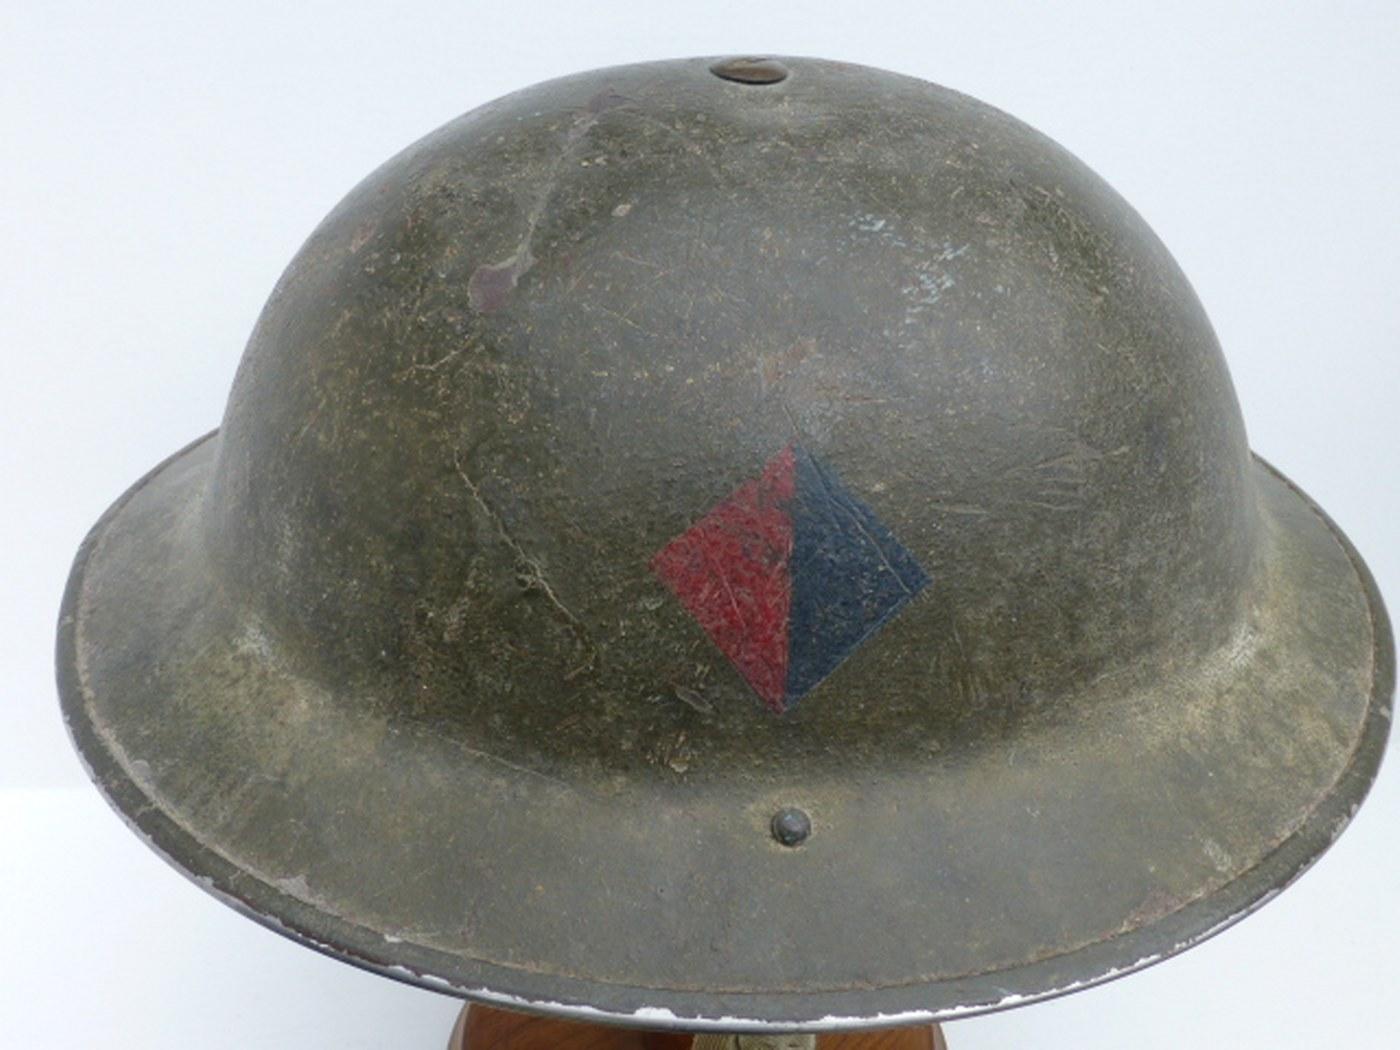 Ww1 british helmet insignia